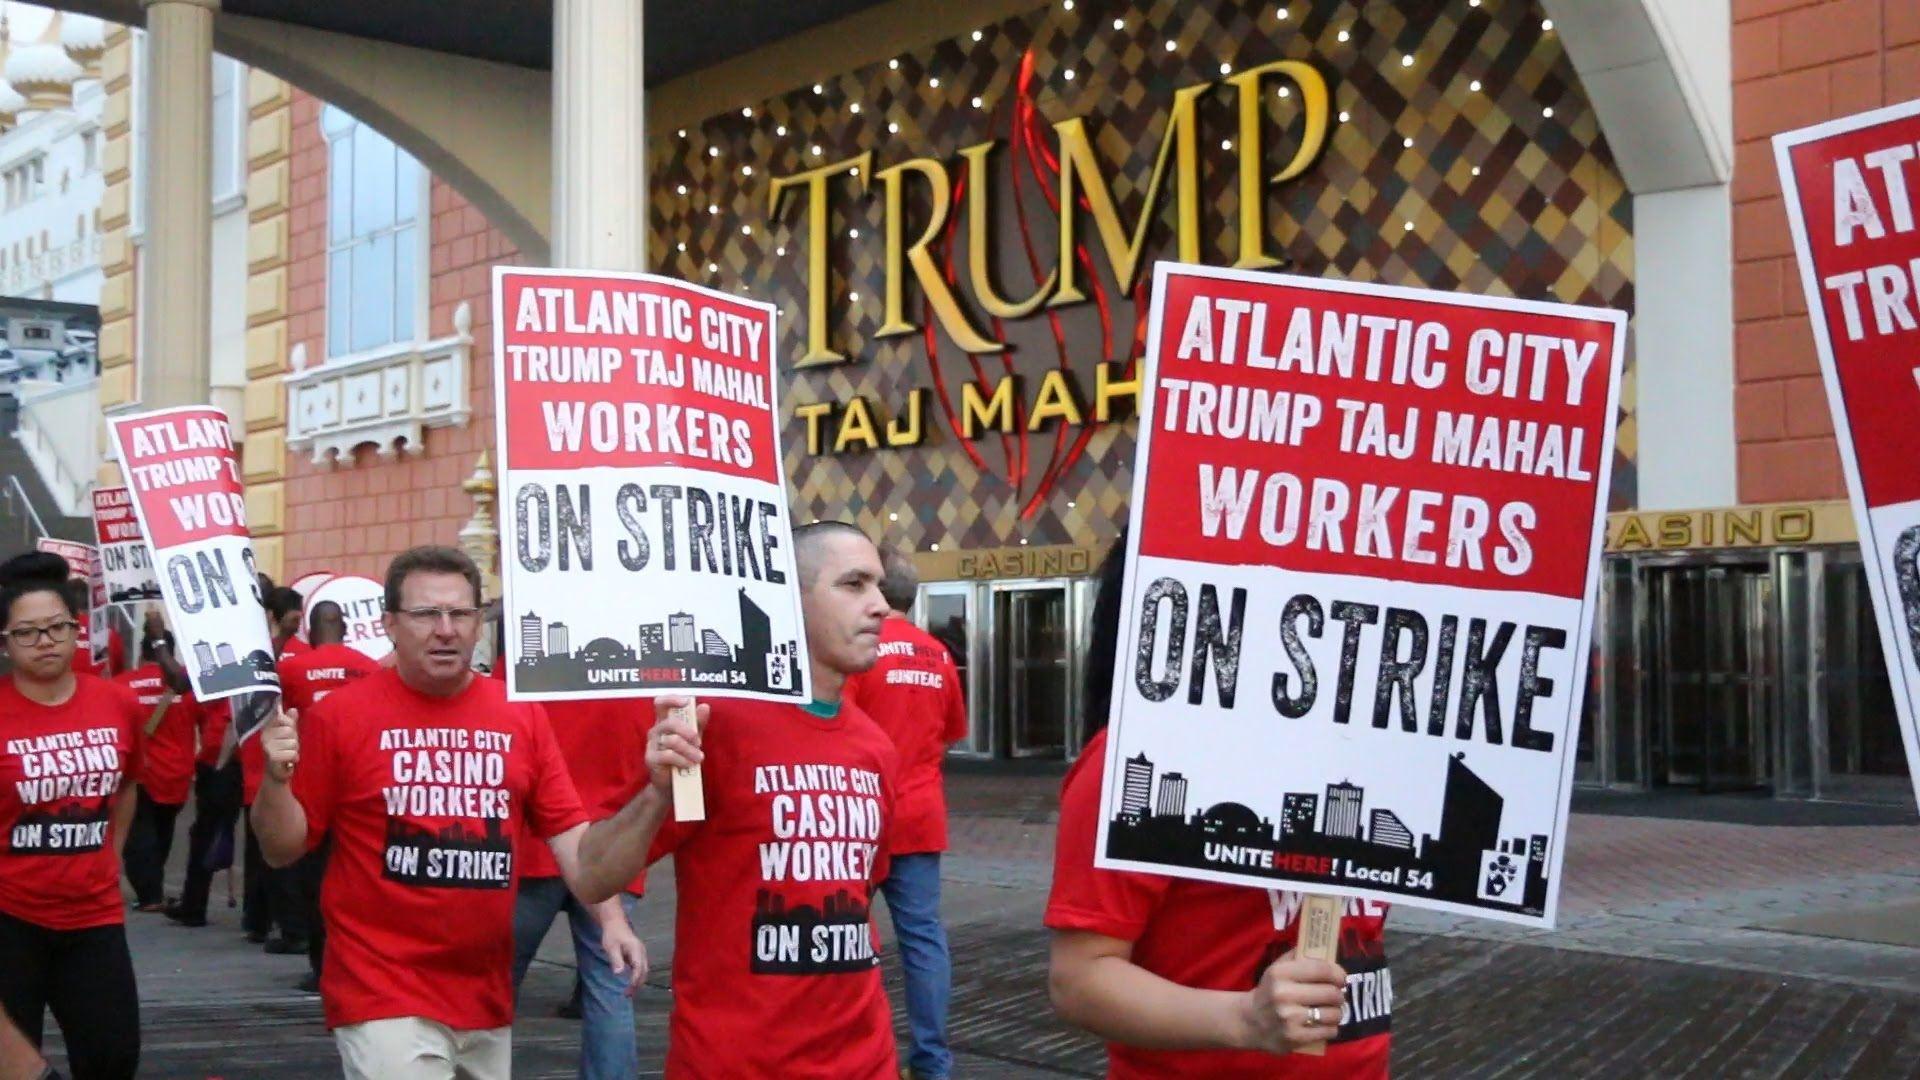 Atlantic City casinos Hard Rock